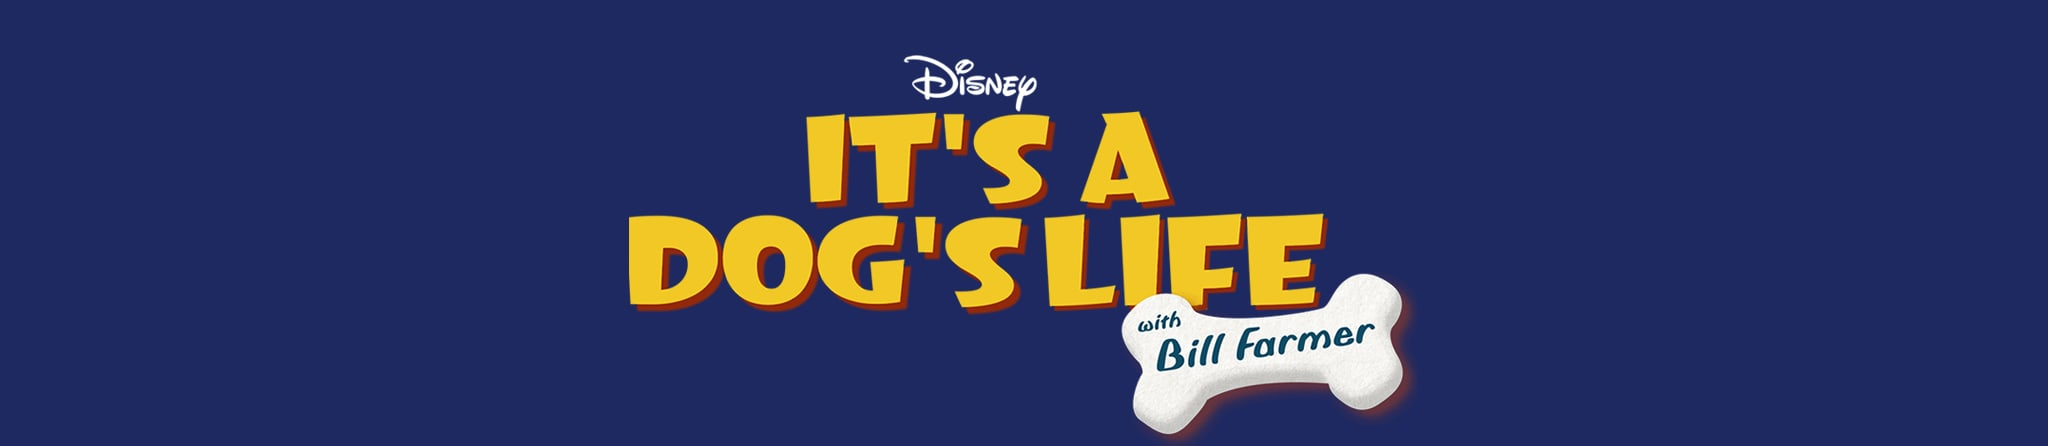 Disney | It's A Dog's Life with Bill Farmer